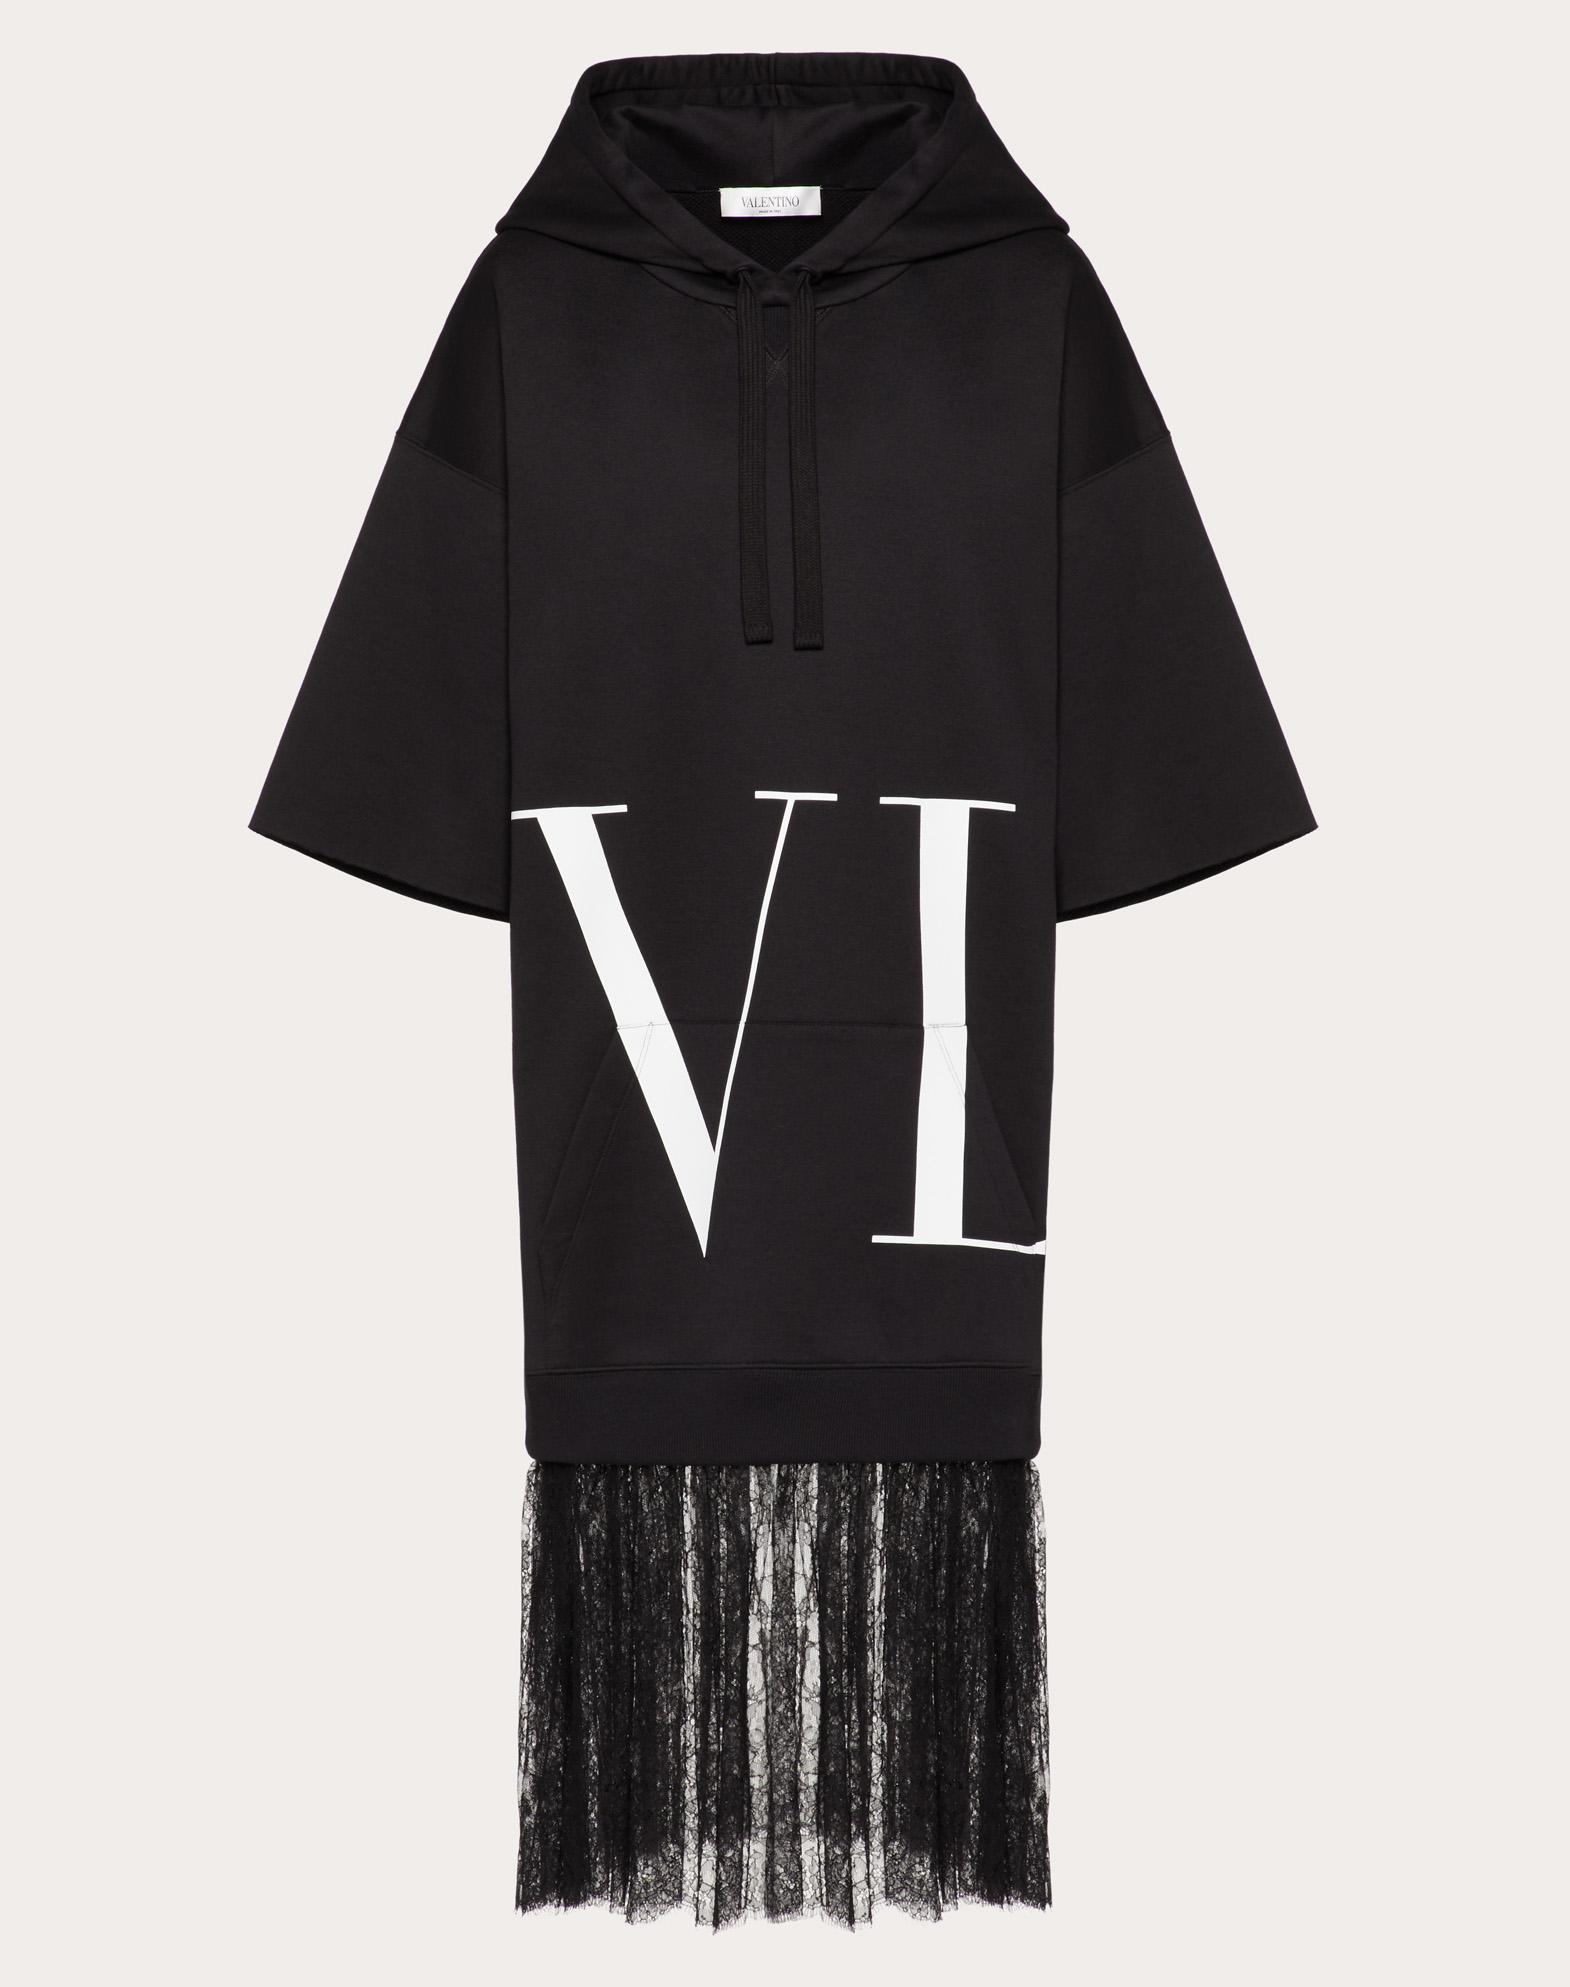 MACRO VLTN DETAIL AND CHANTILLY SWEATSHIRT DRESS